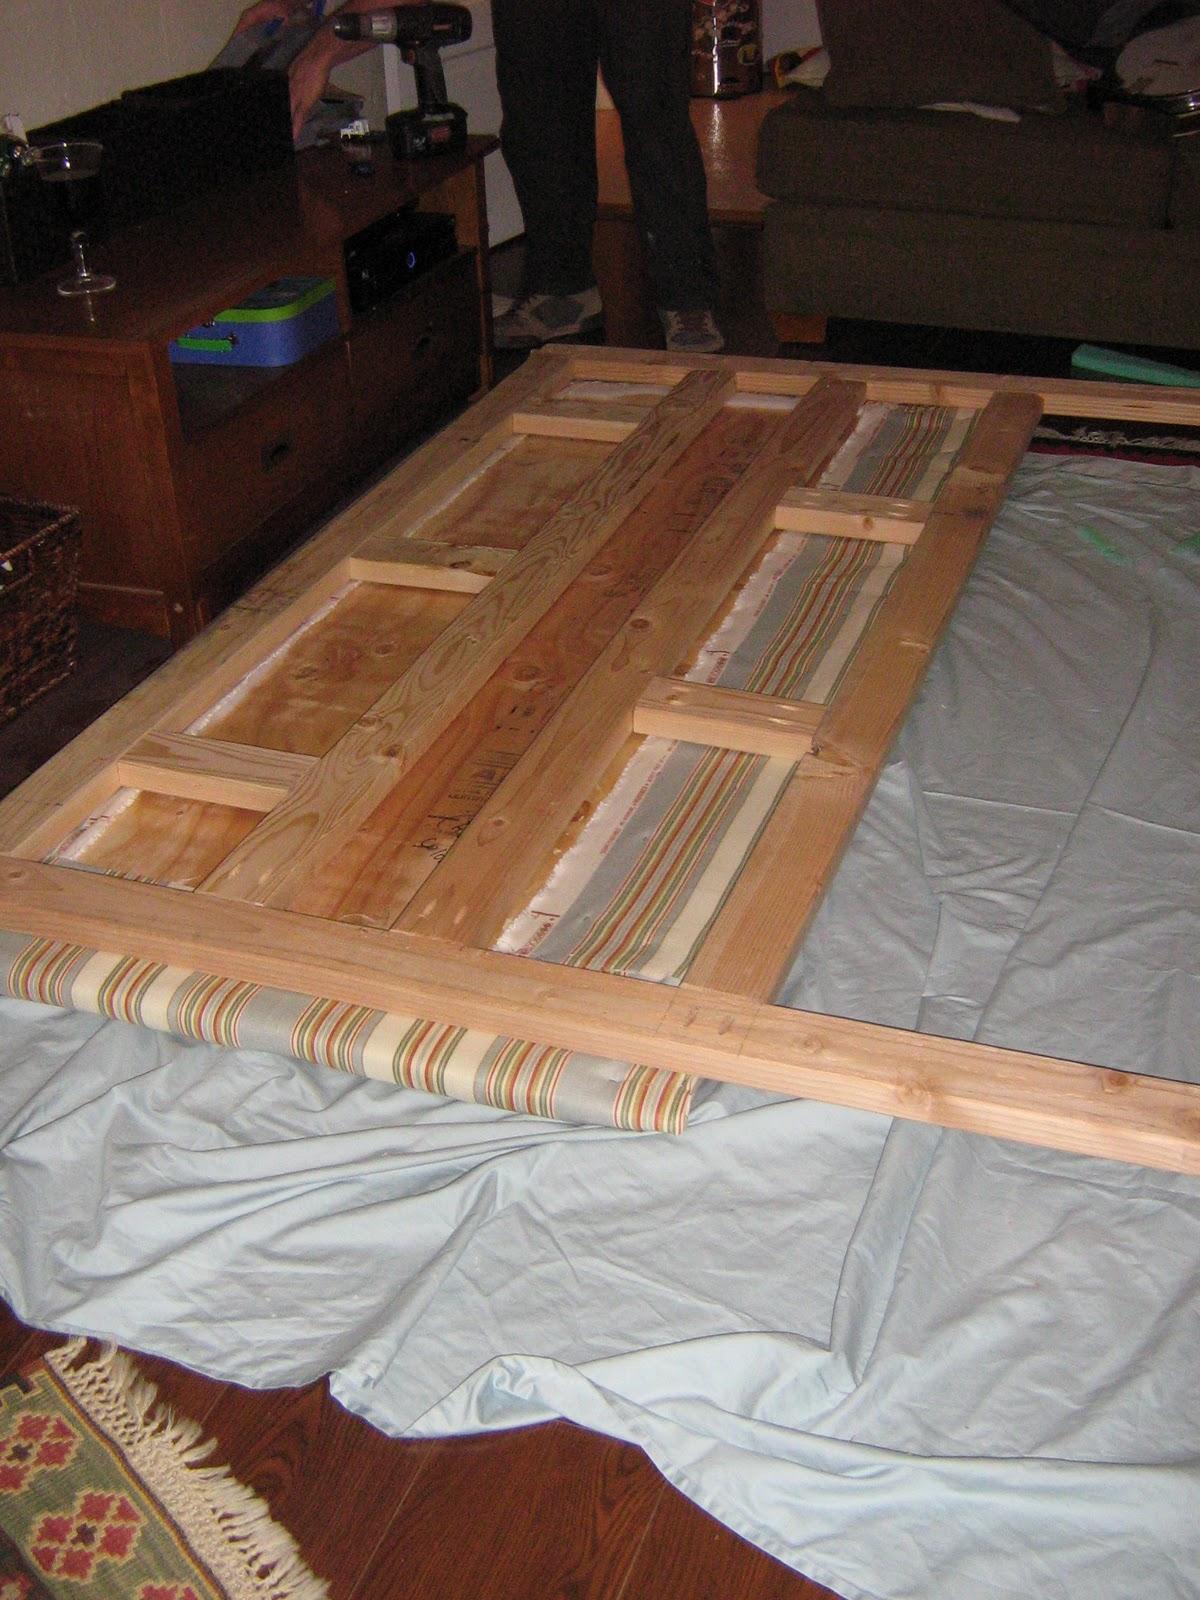 Upholster Bed Frame Queen